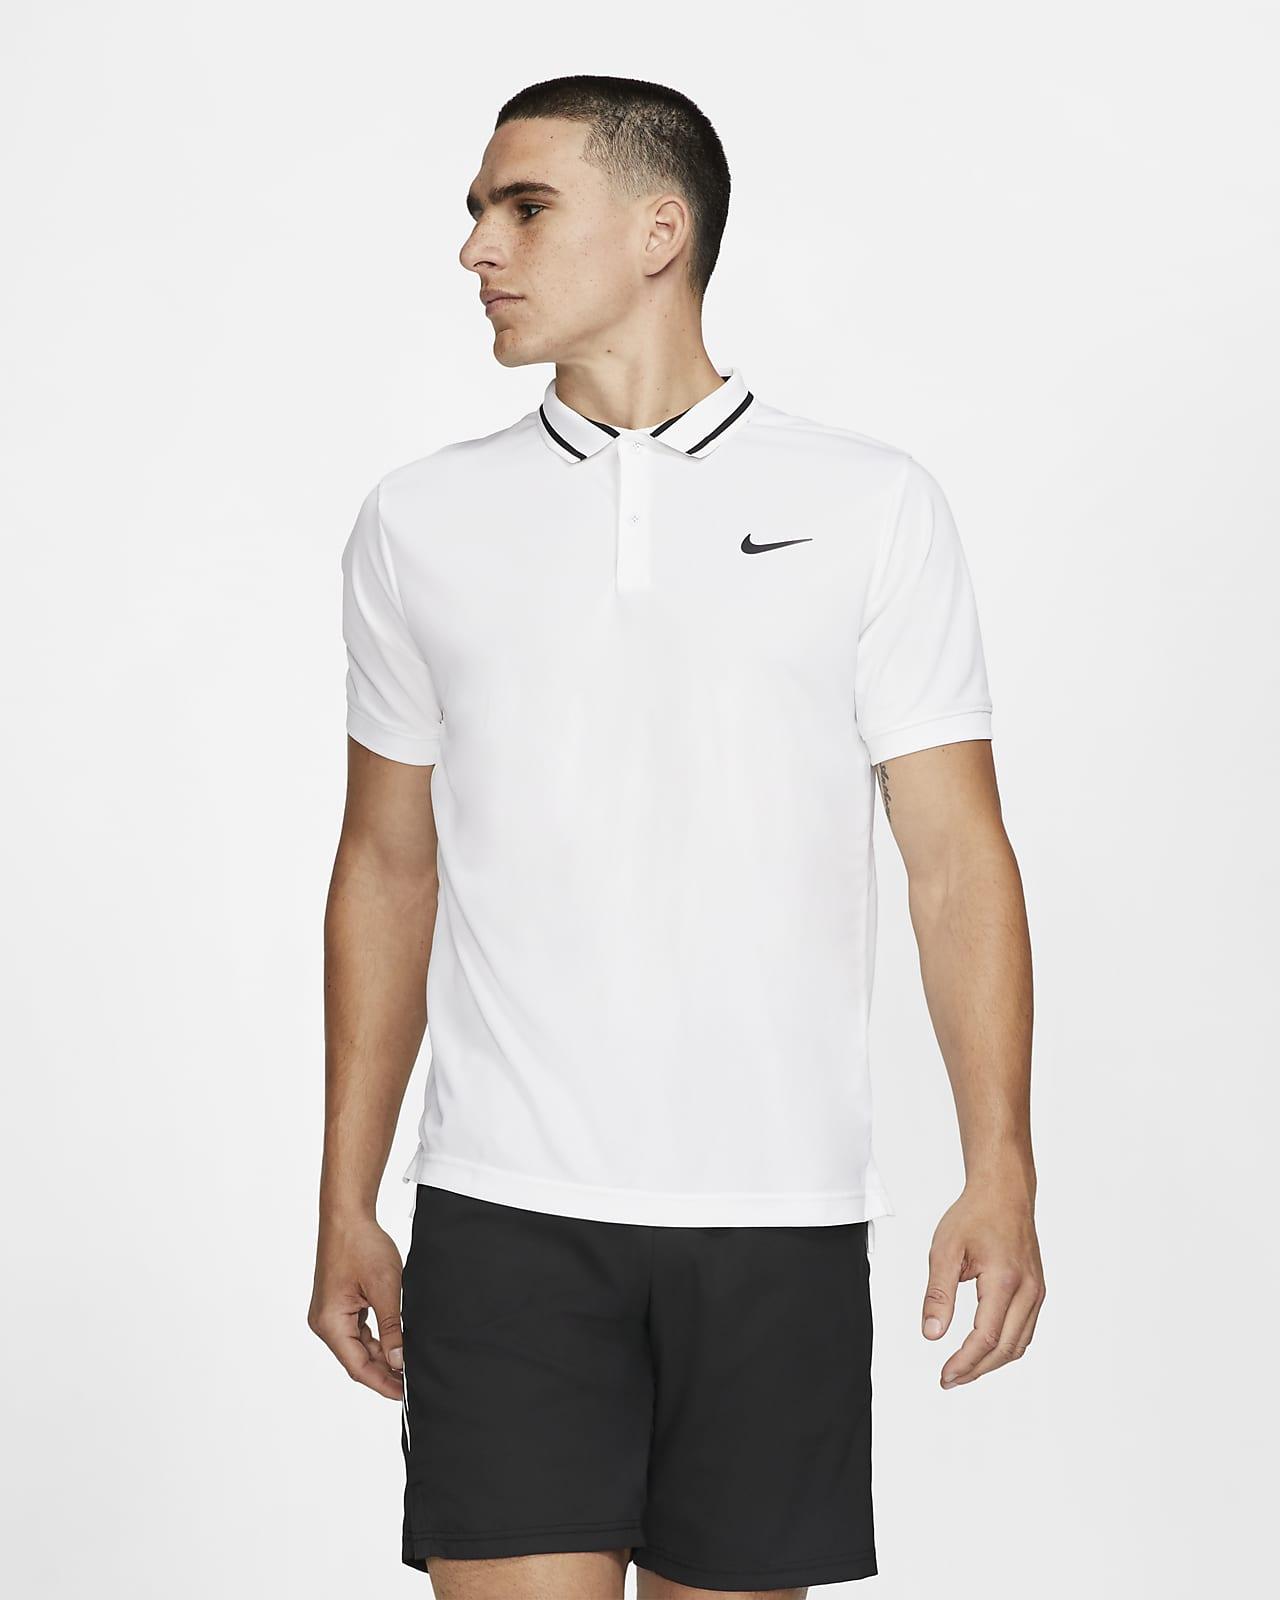 Мужская теннисная рубашка-поло NikeCourt Dri-FIT